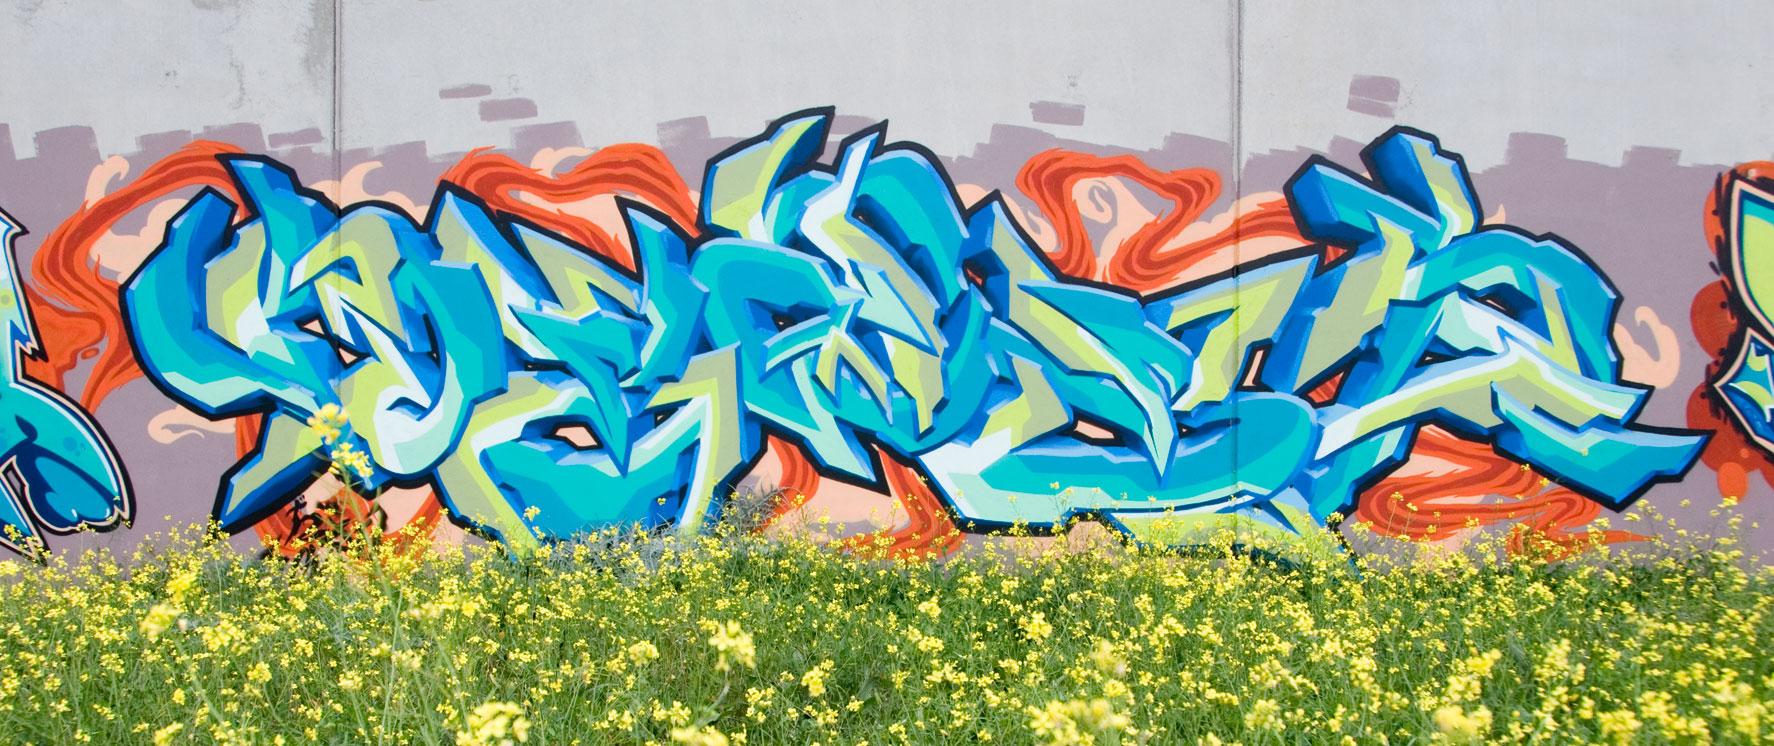 all-those-shapes_-_reaes_-_pollen-frolic_-_deer-park